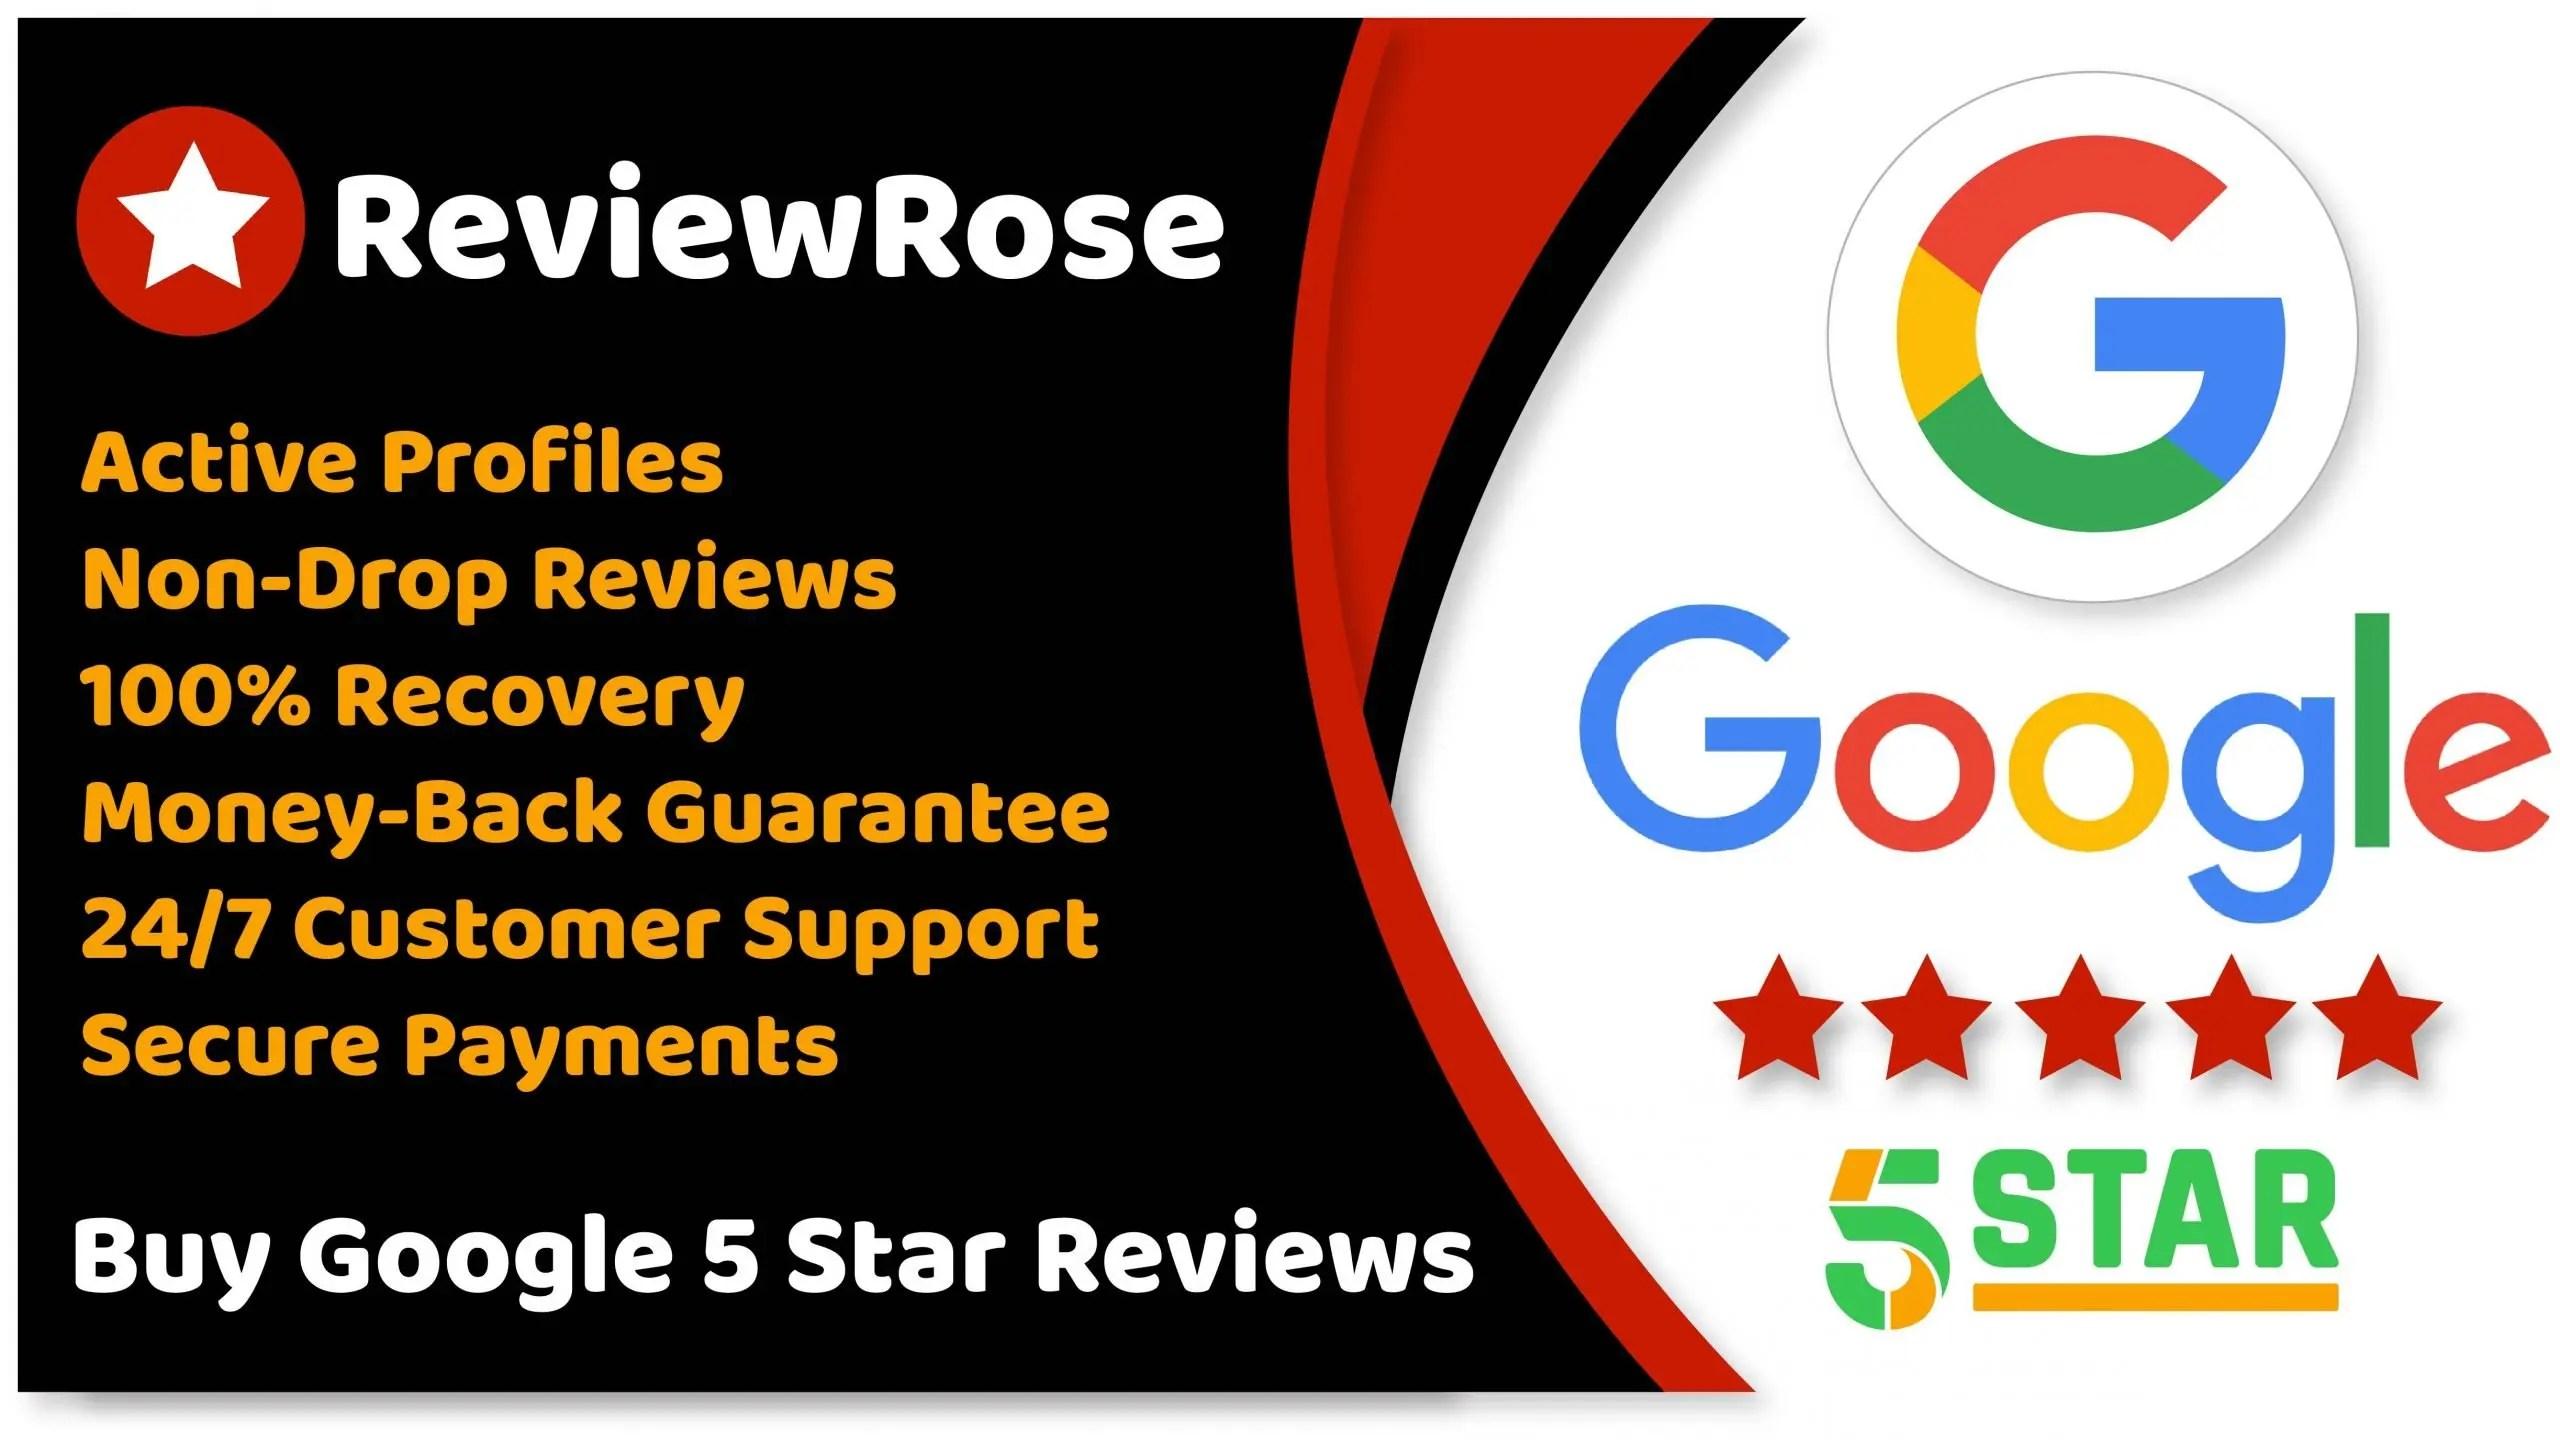 Buy Google 5 Star ReviewsBuy Google 5 Star Reviews